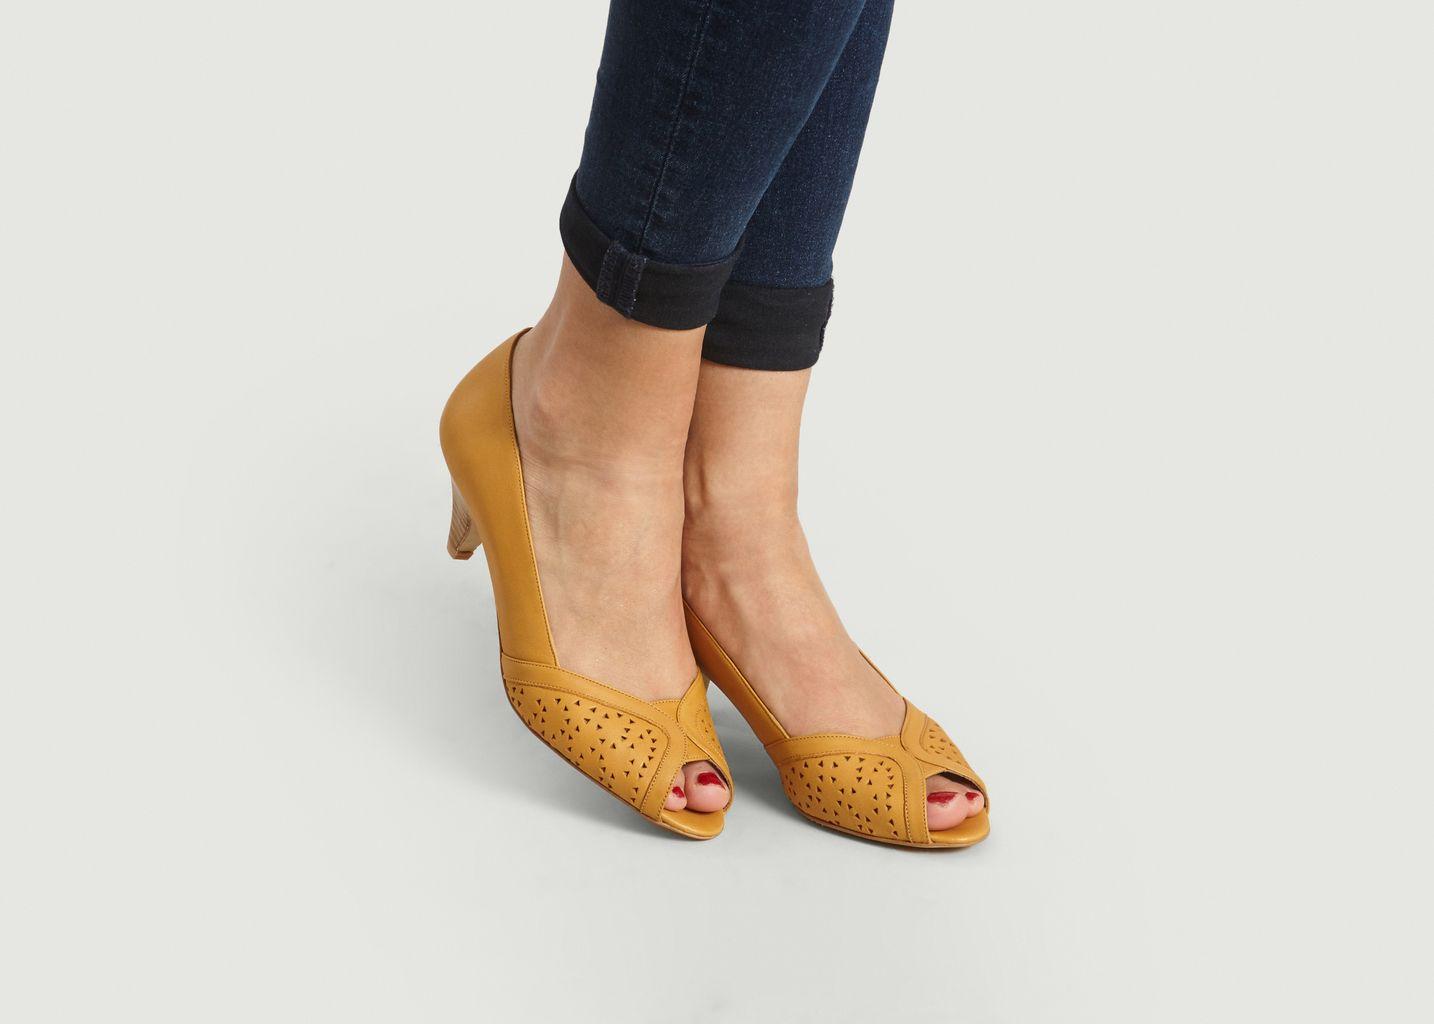 Sandales Papoose Totem - Sessun